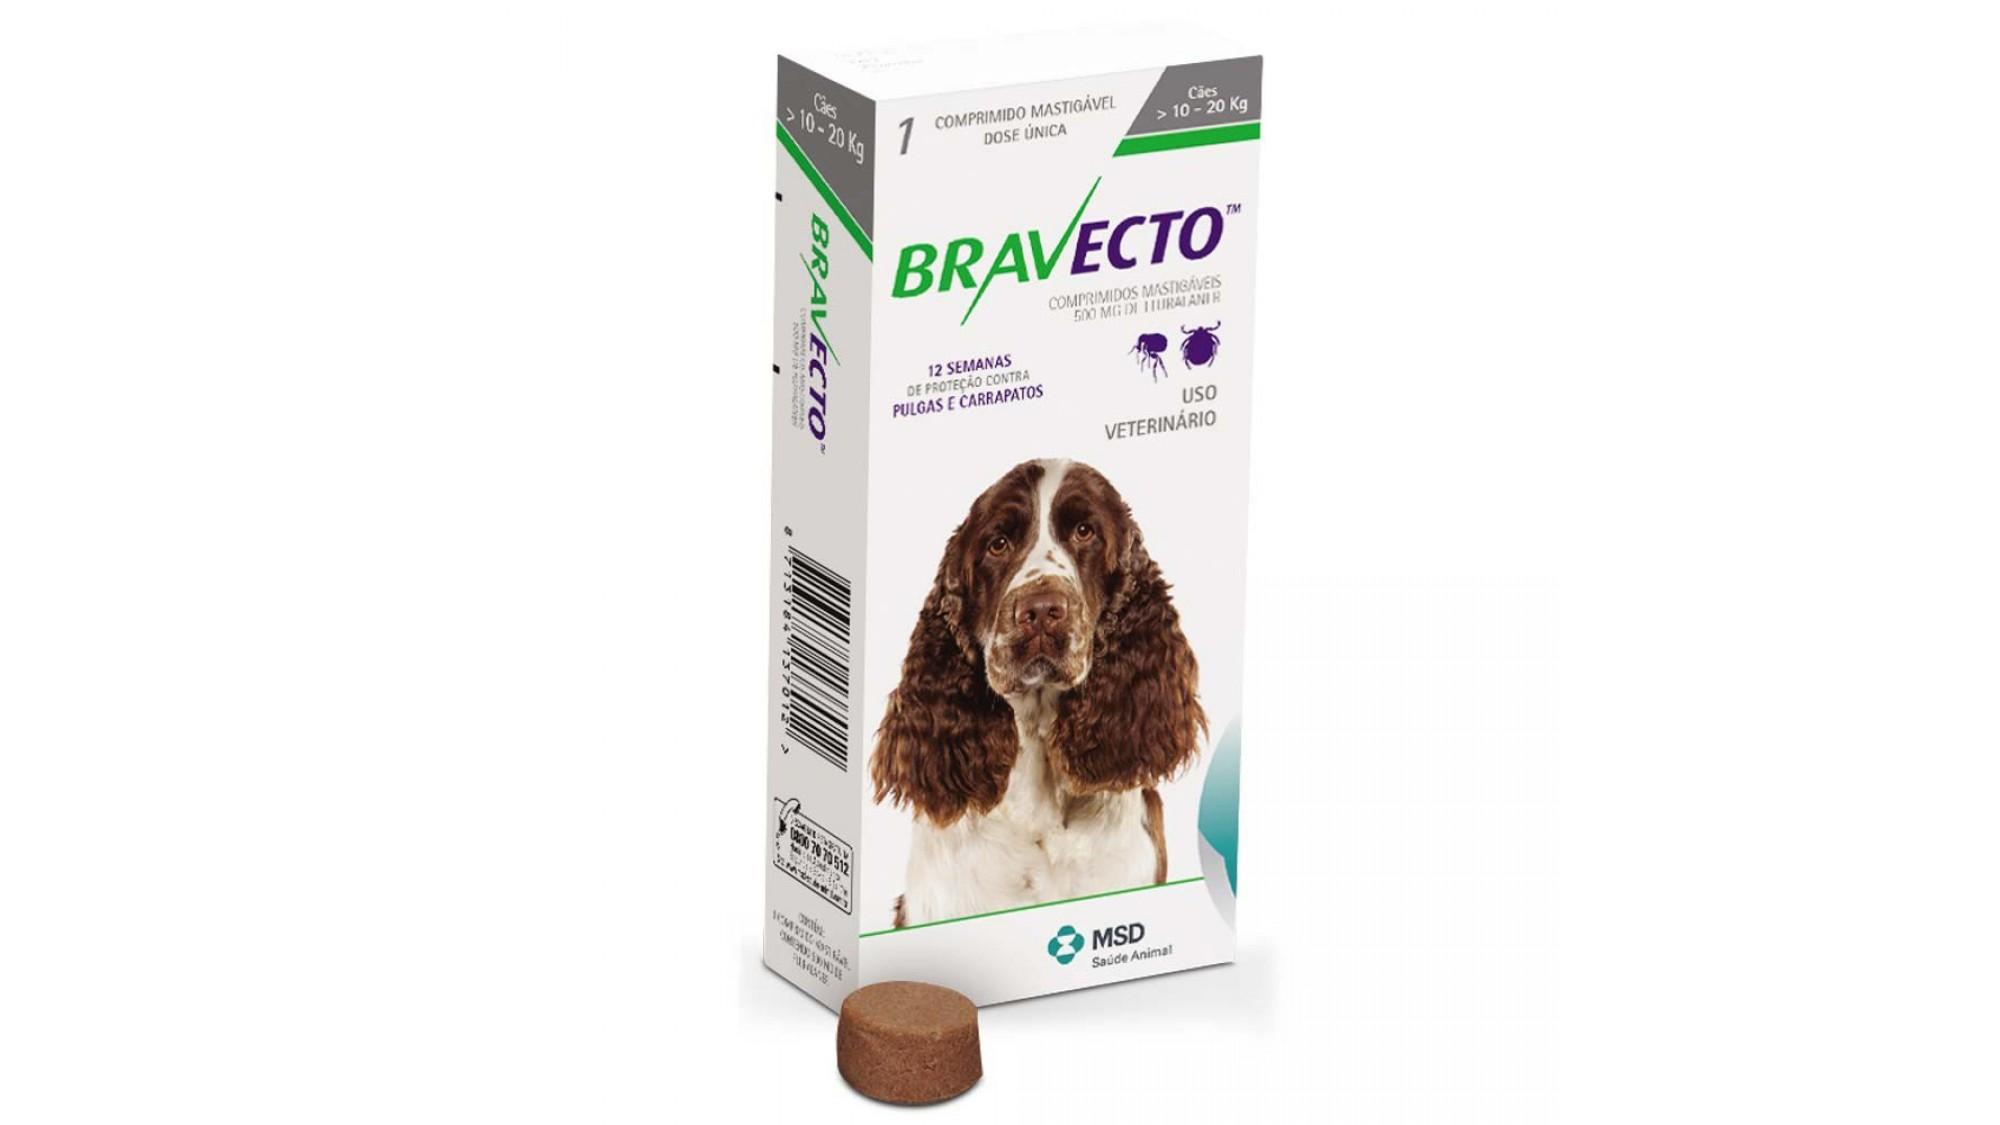 Bravecto 10-20 Kg 1 Tableta x 500 Mg shop4pet.ro